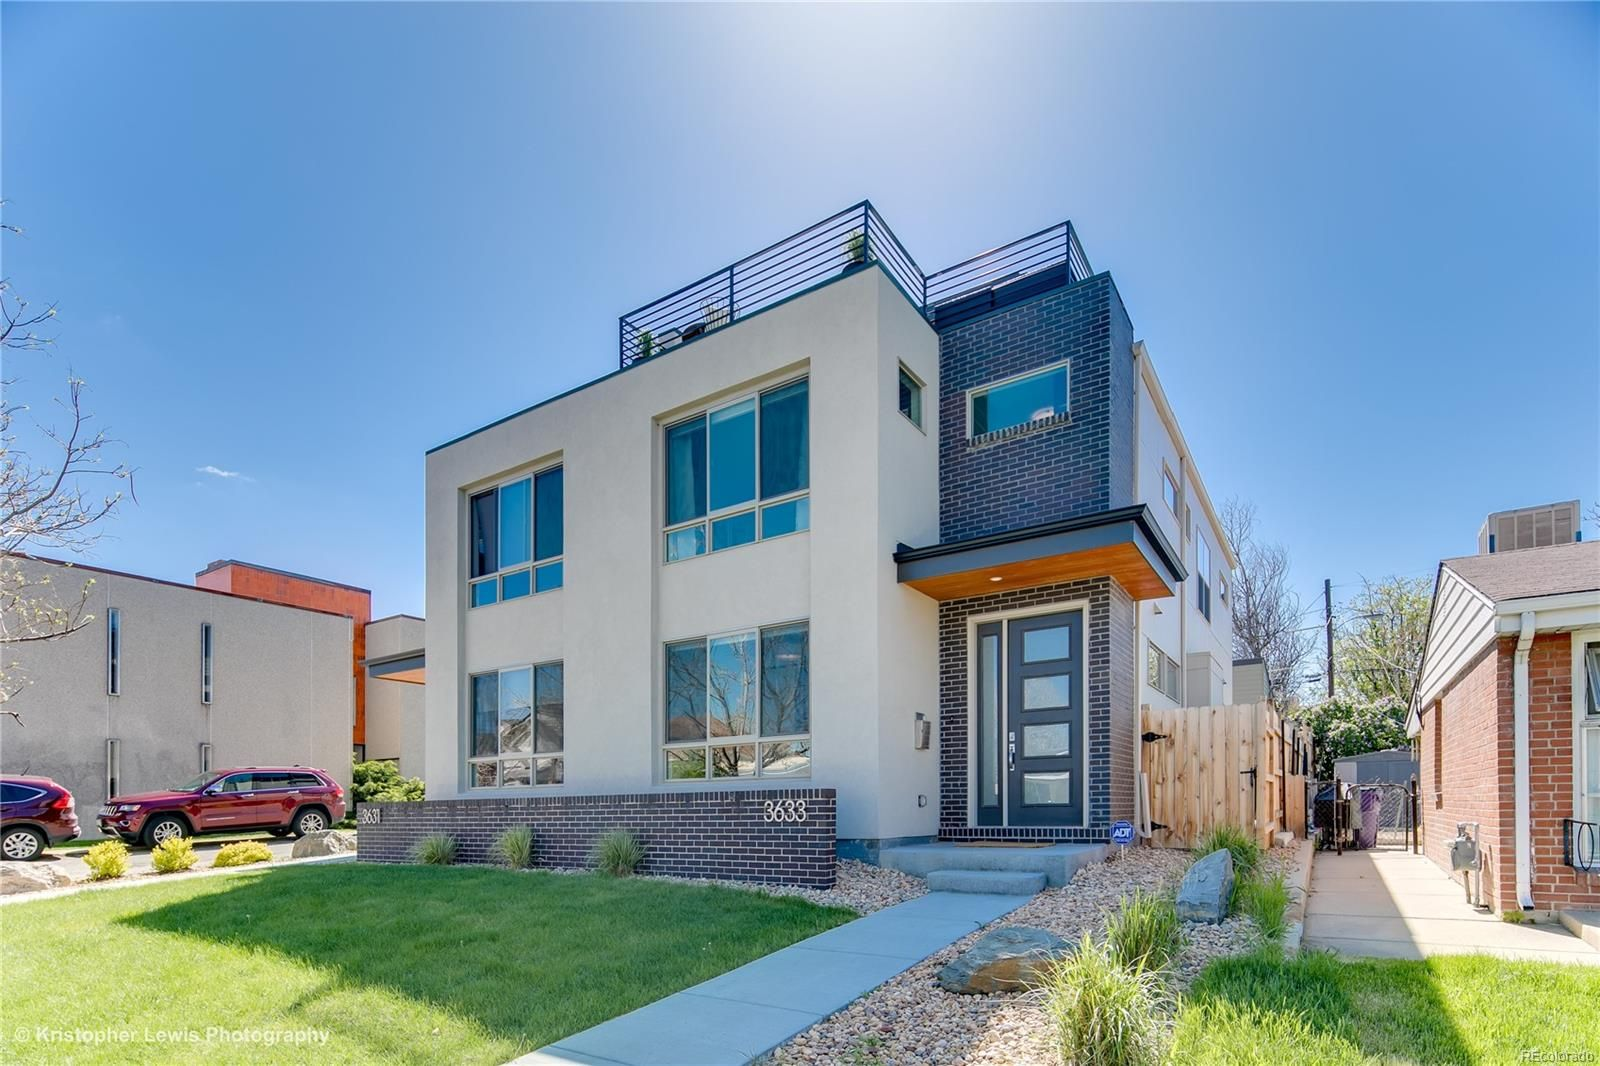 3633 Pecos St, Denver, CO 80211 - Recently Sold | Trulia